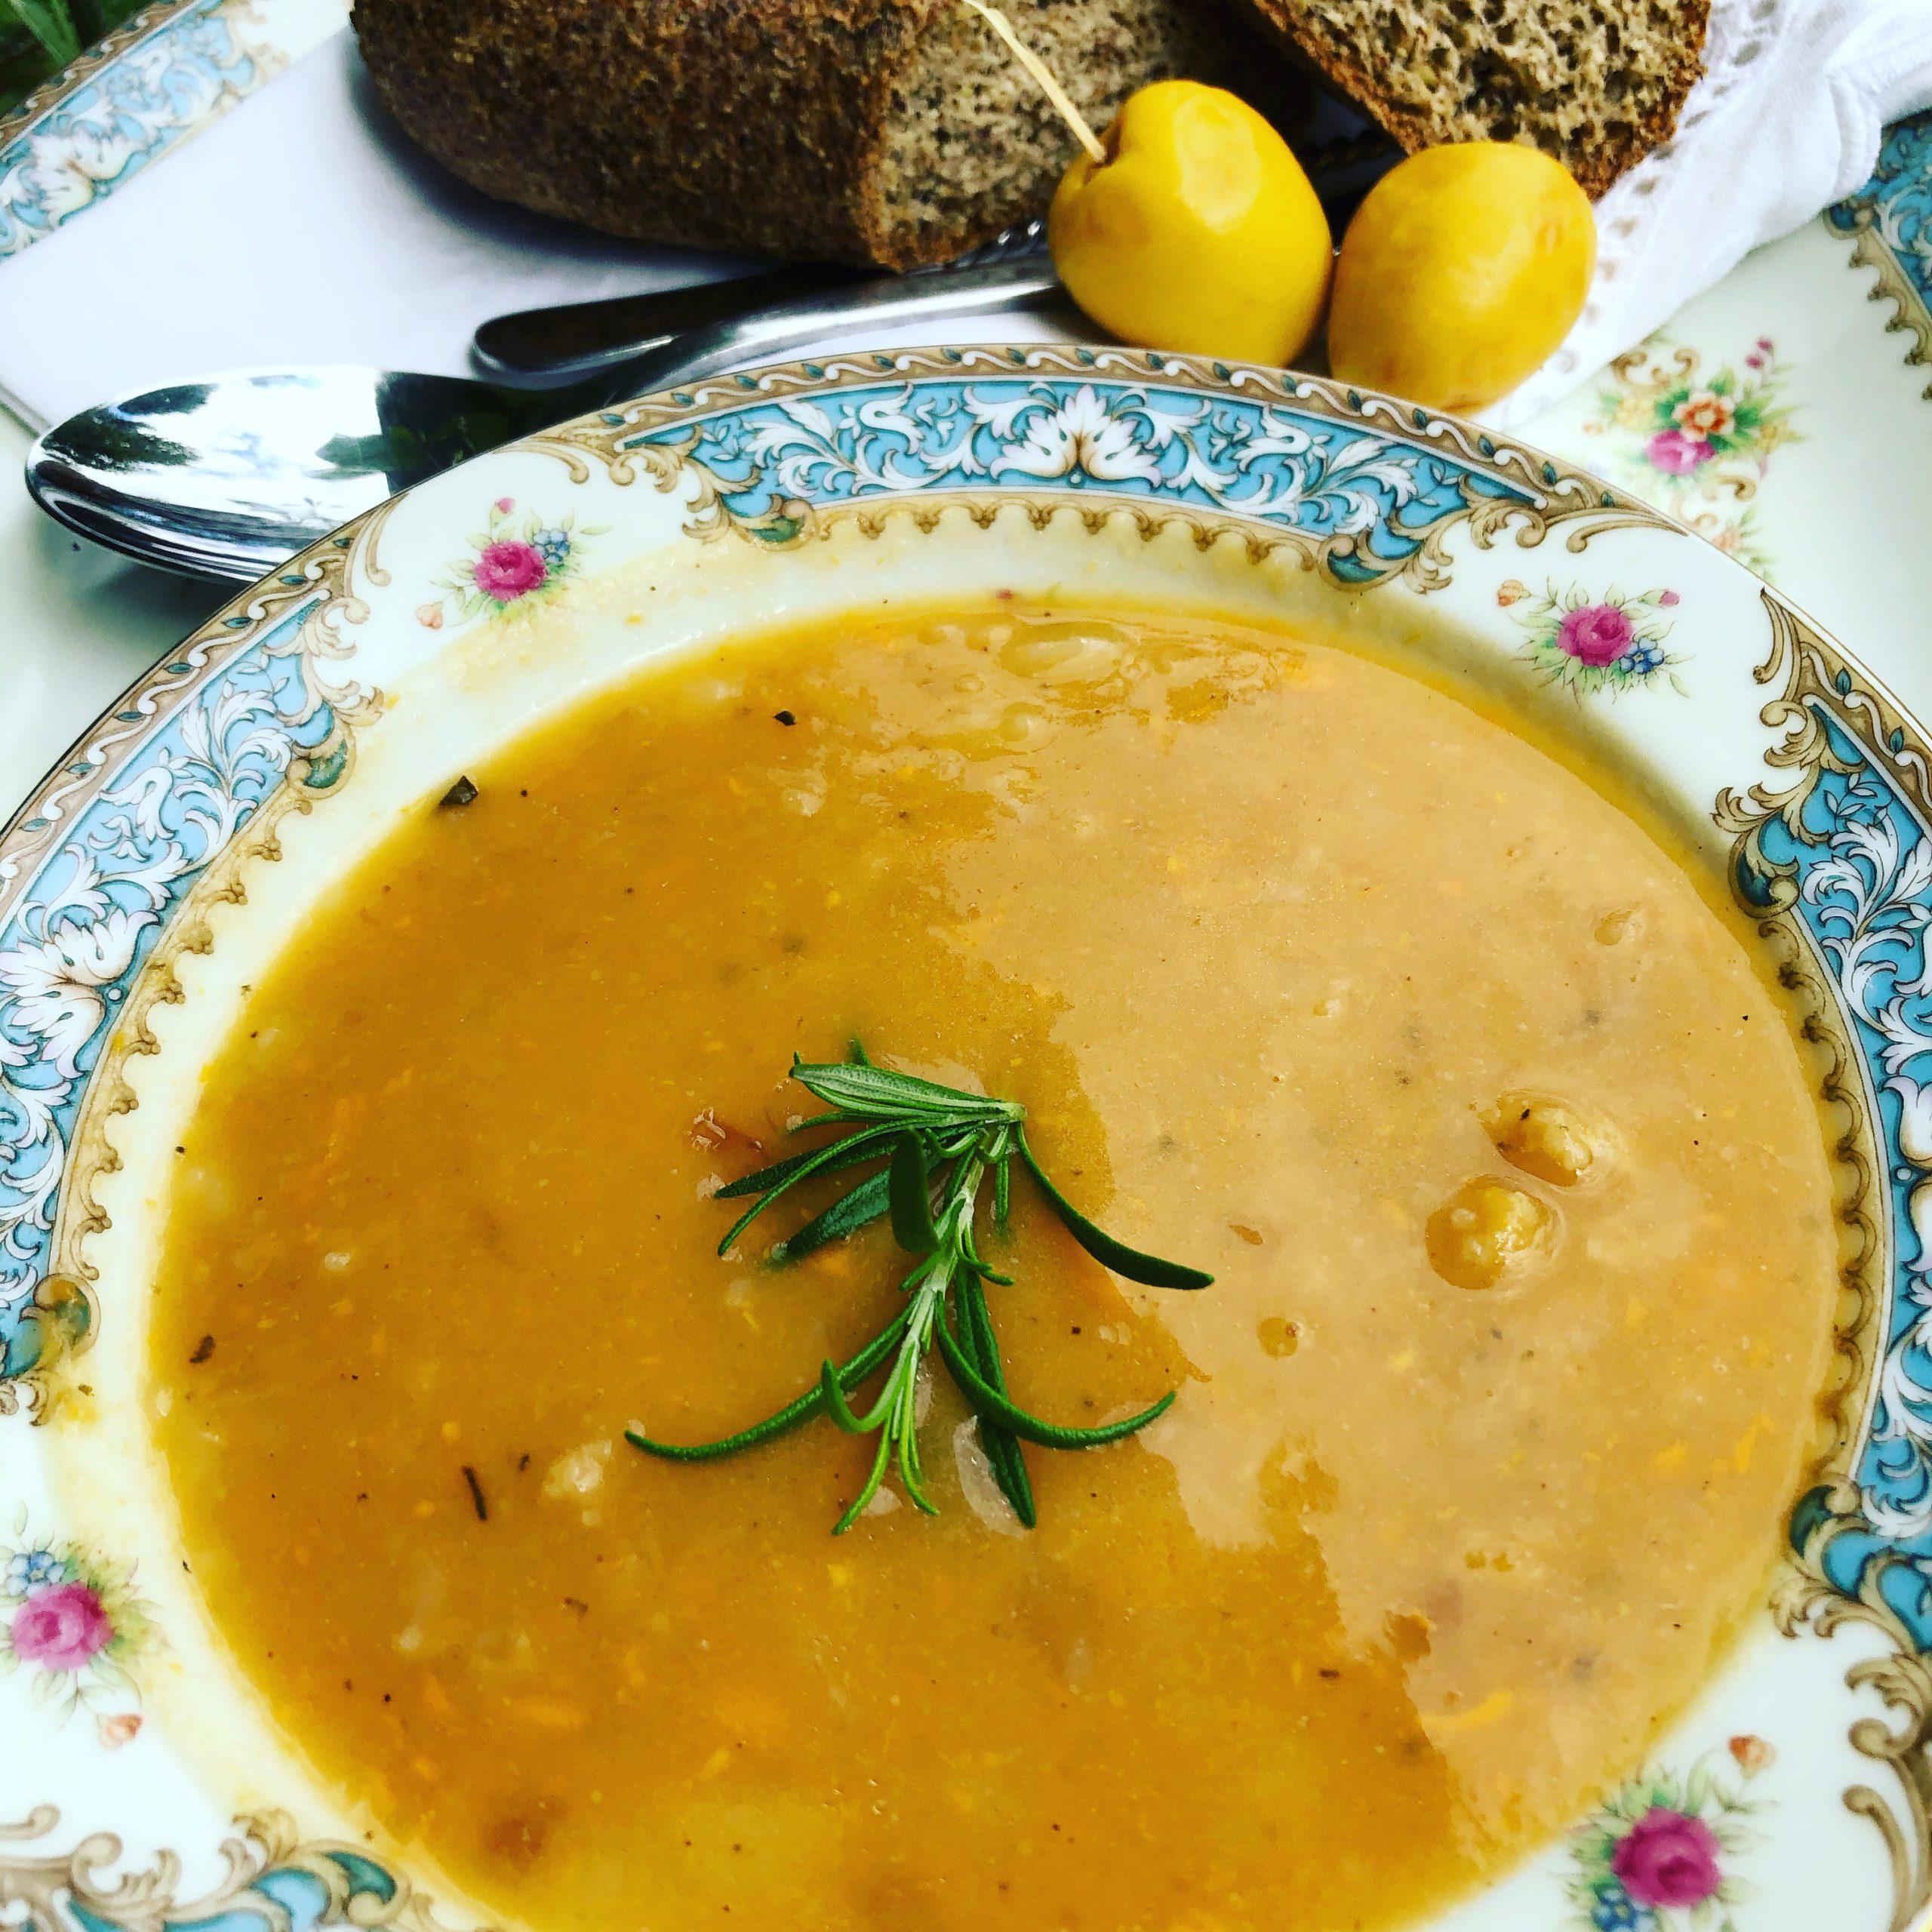 Lectin-Free Cauliflower Soup